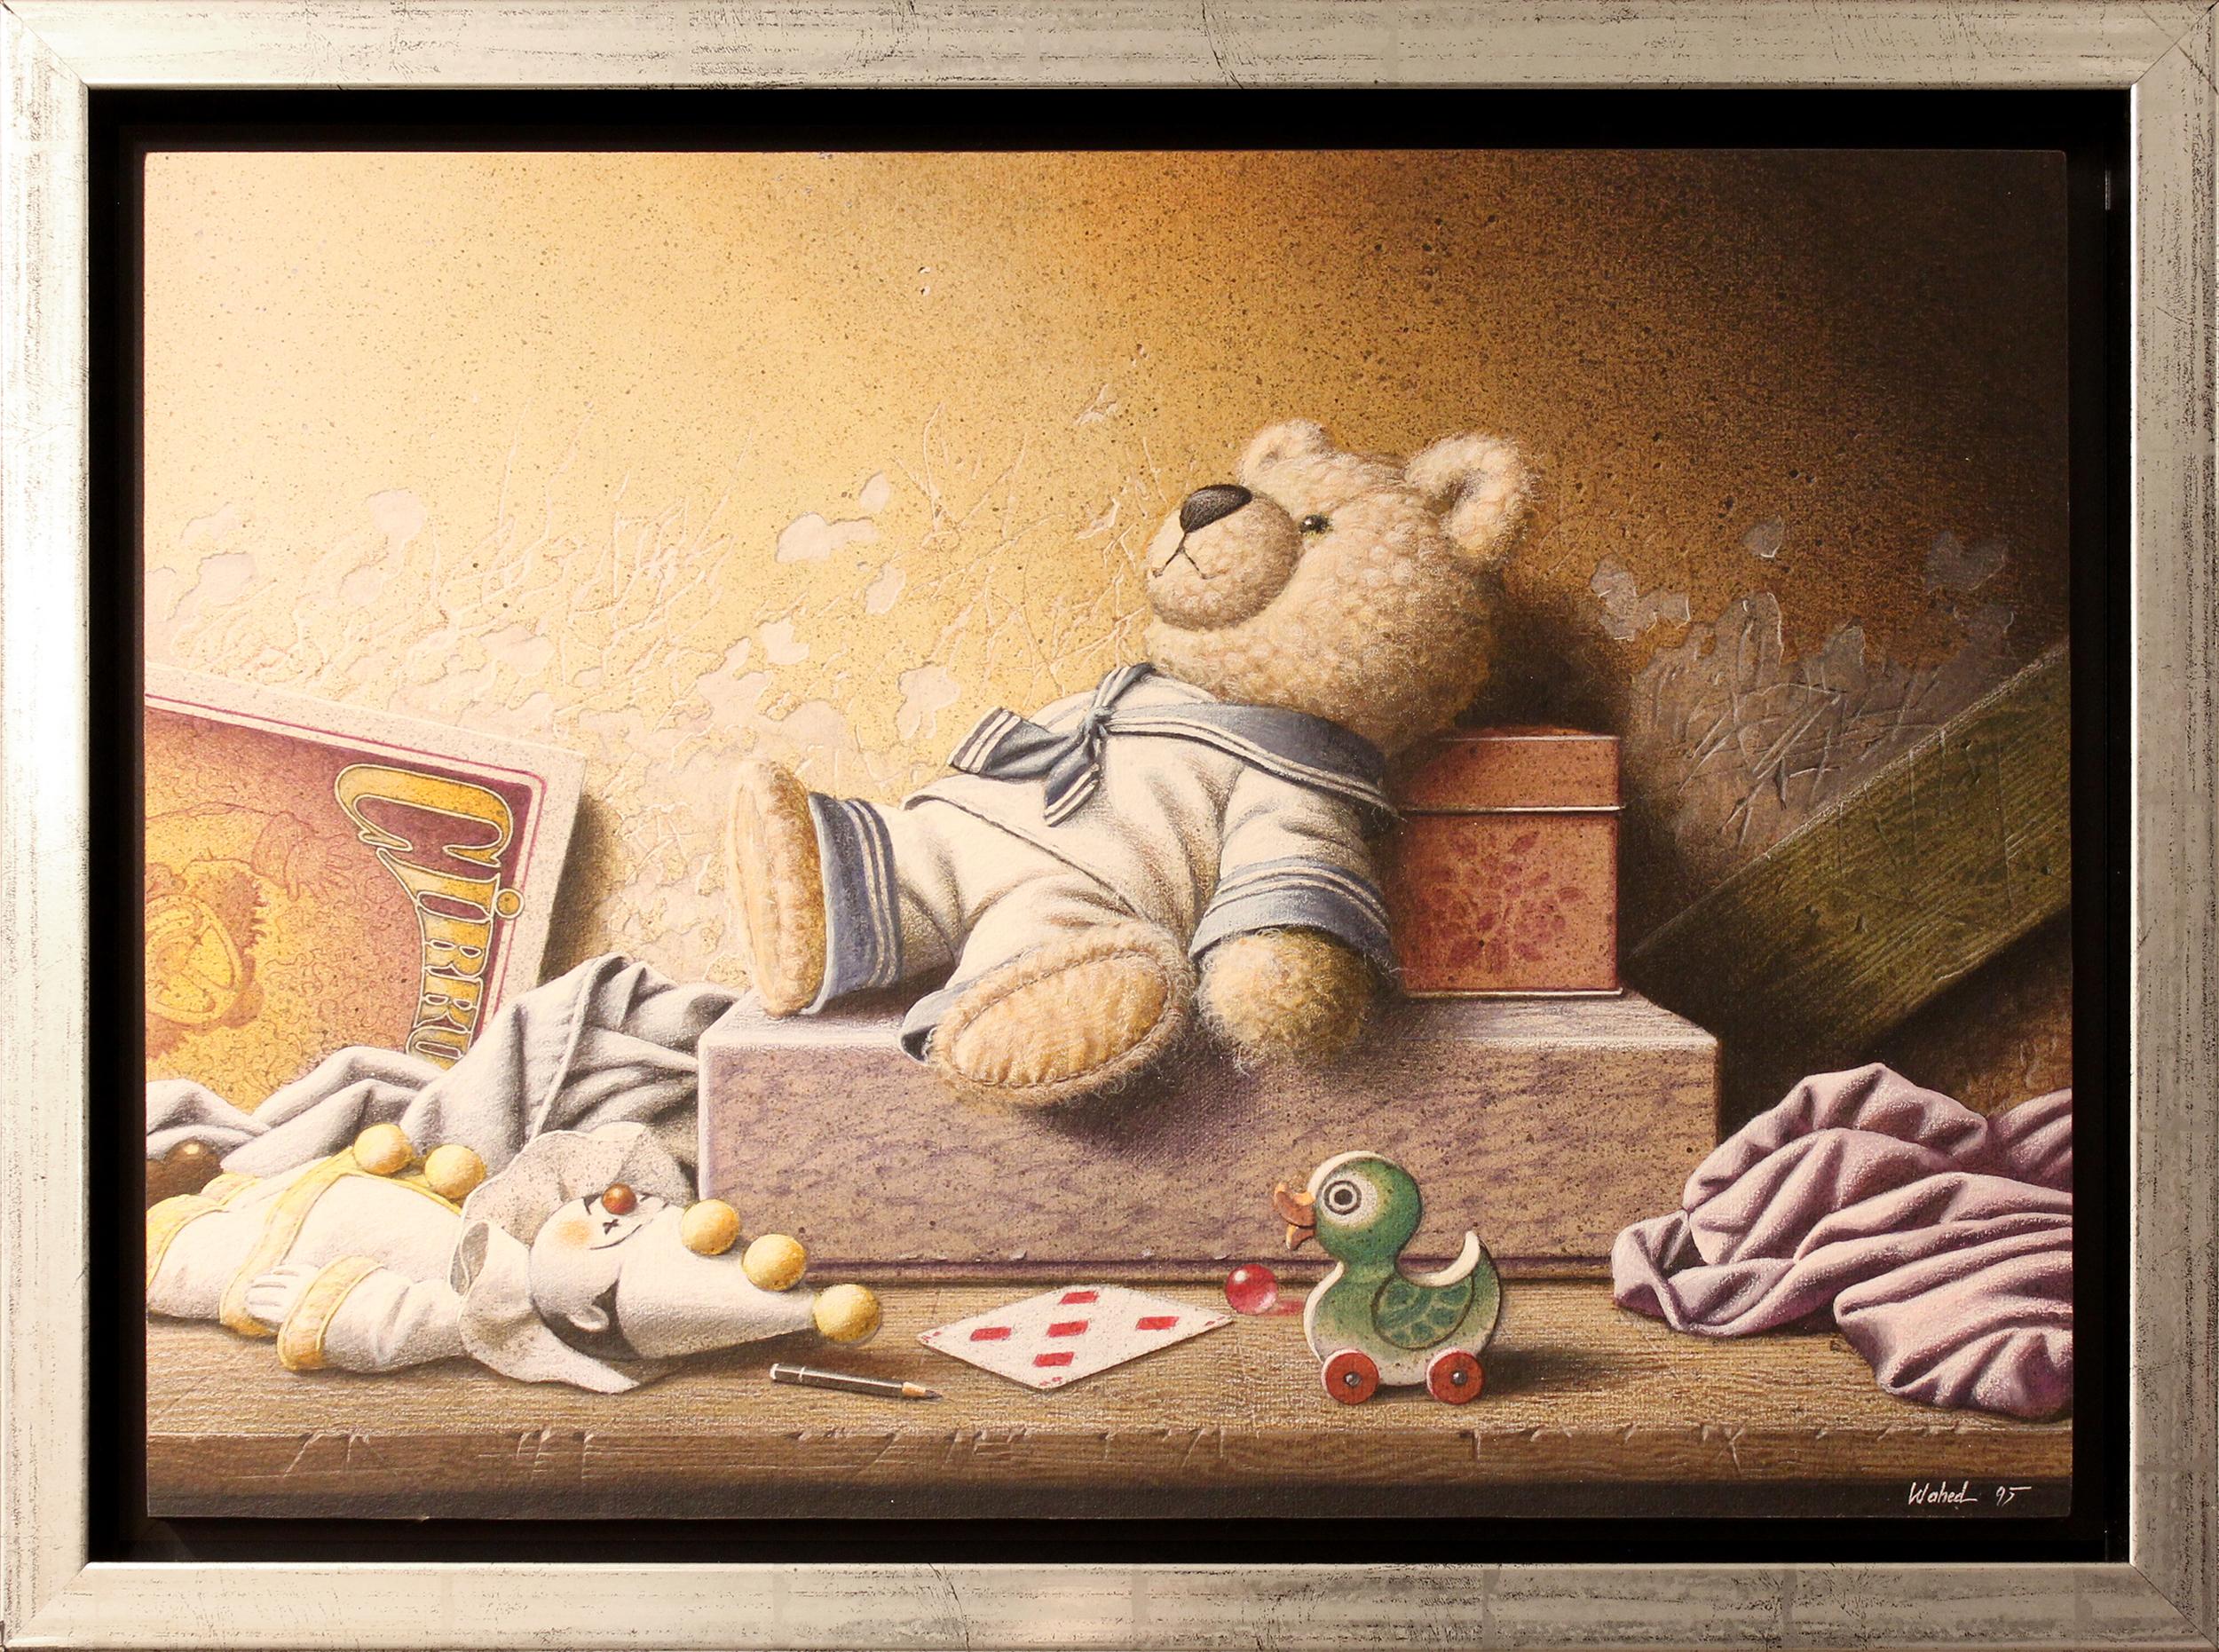 Khakdan Wahed - Teddybär , 0990-012-045